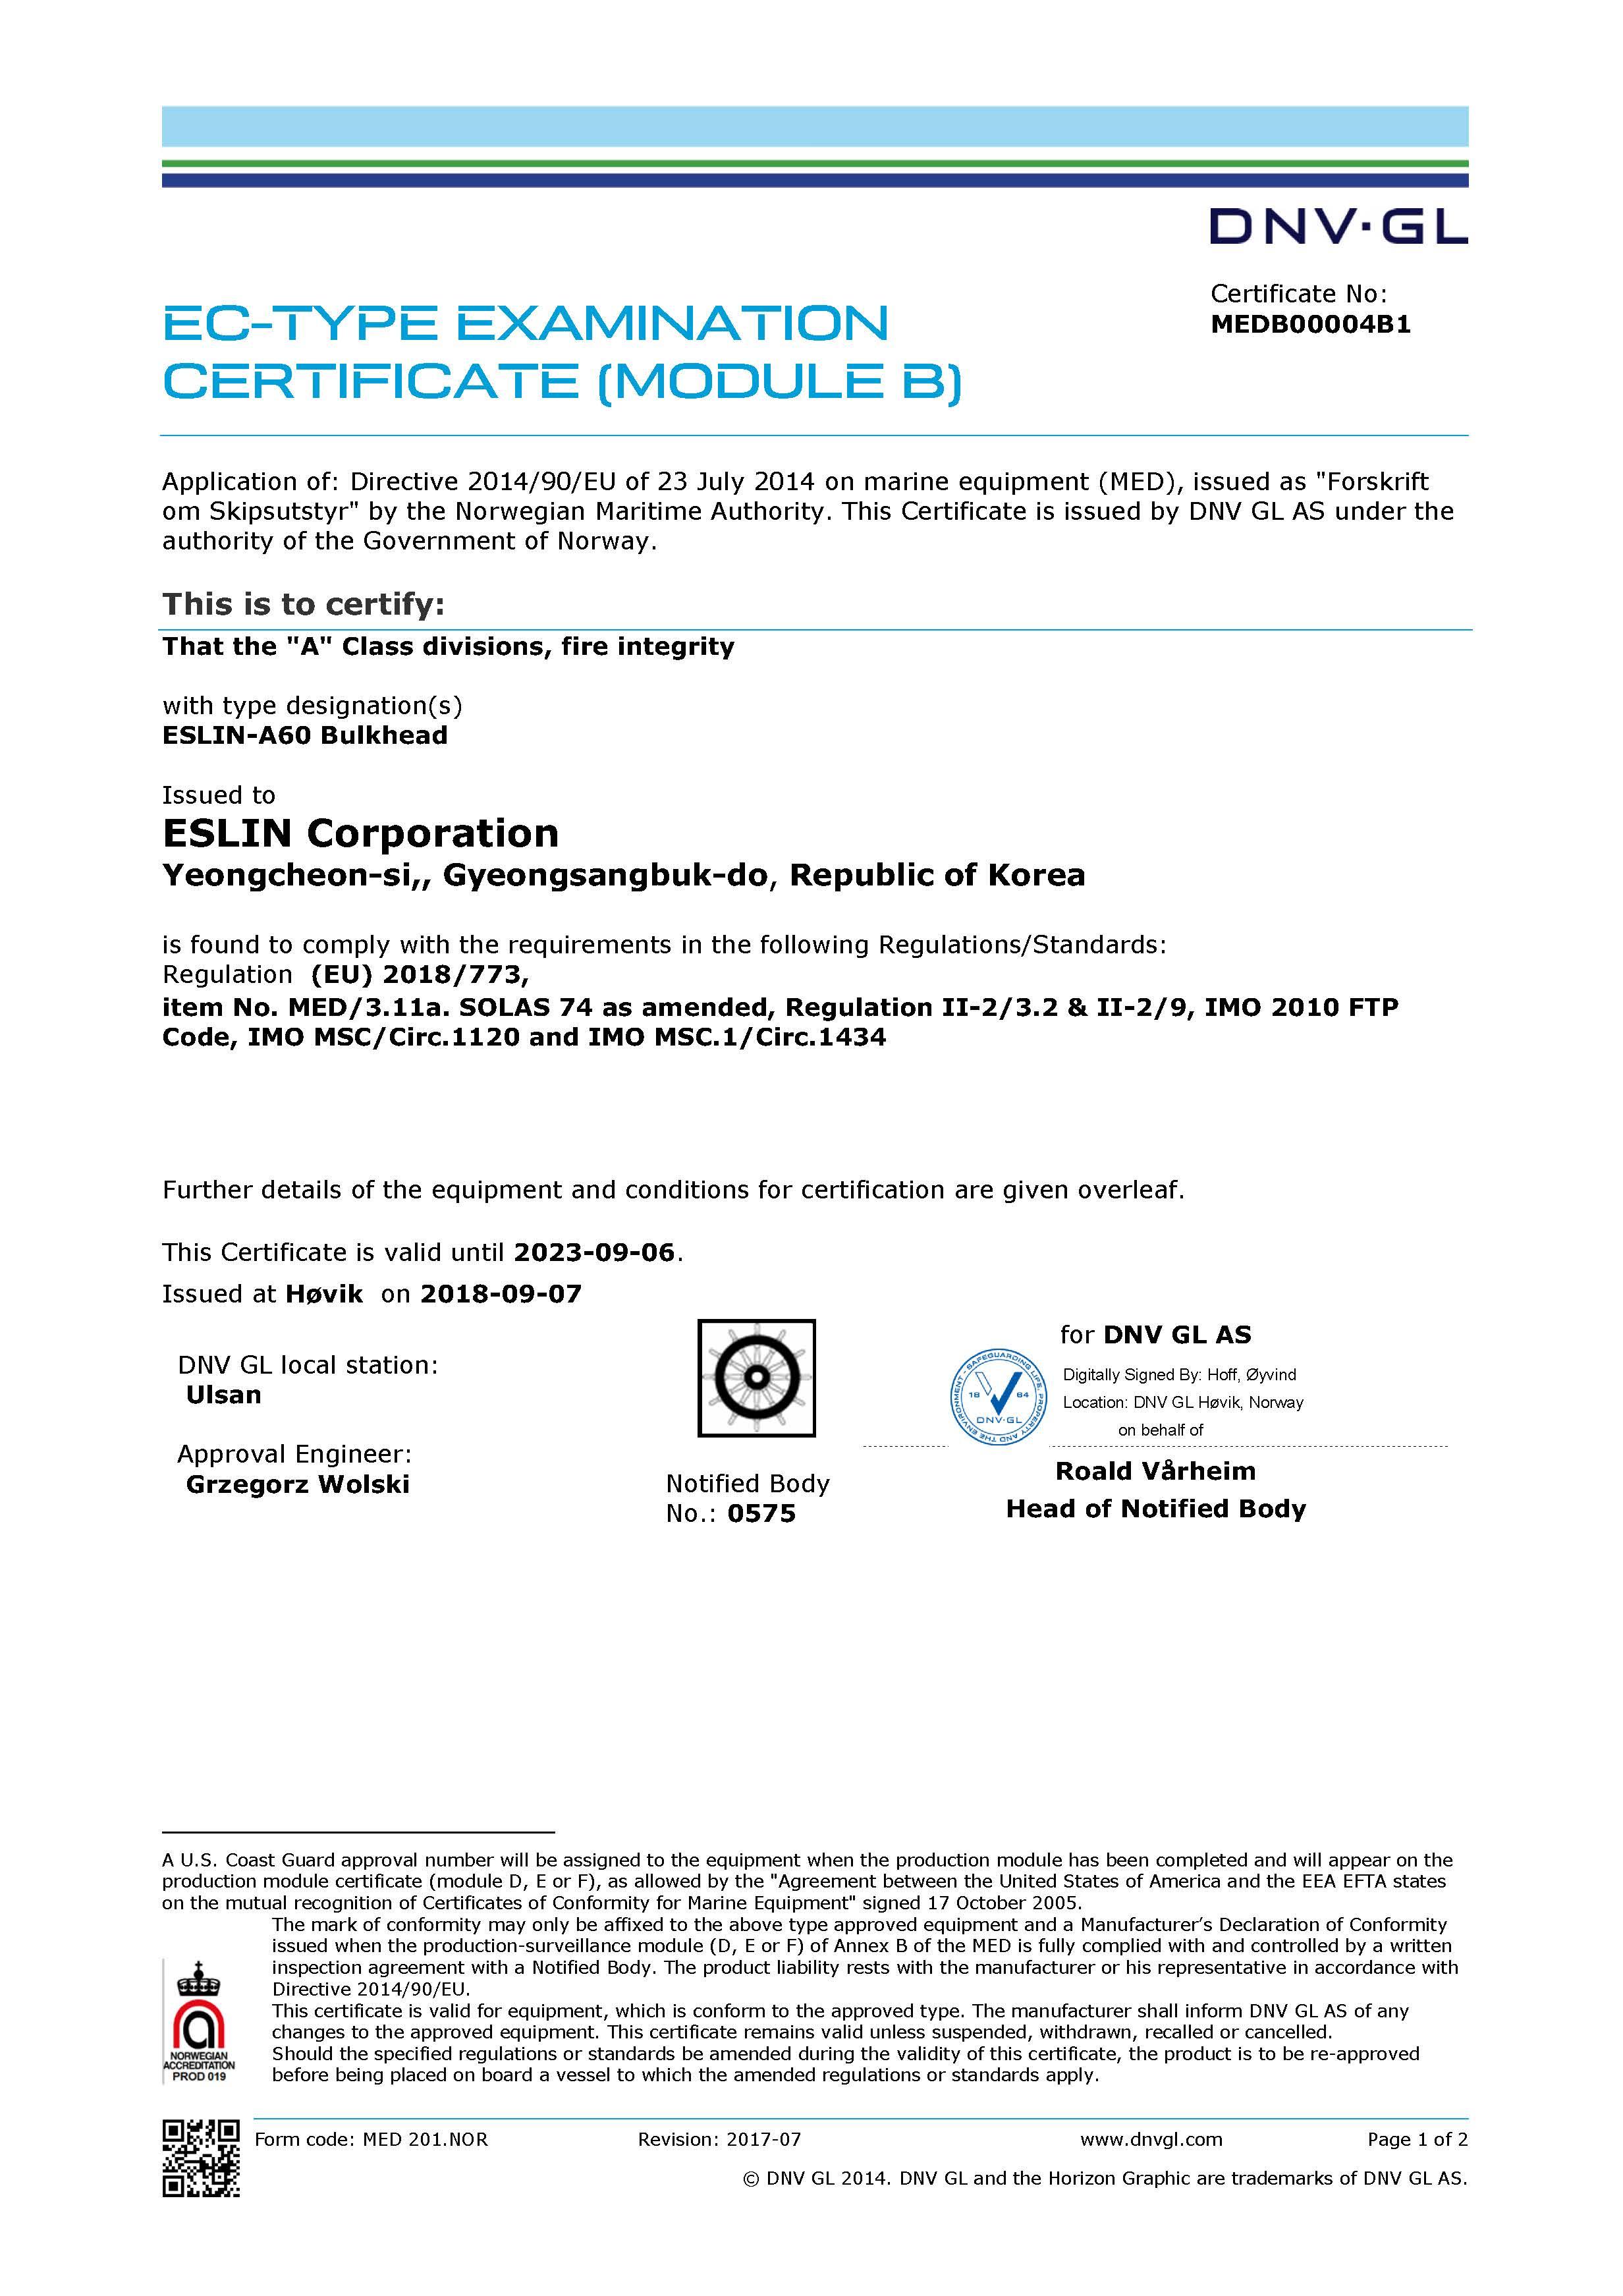 14_ESLIN A60-Bulkhead_DNV_MEDB00004B1_Page_1.jpg